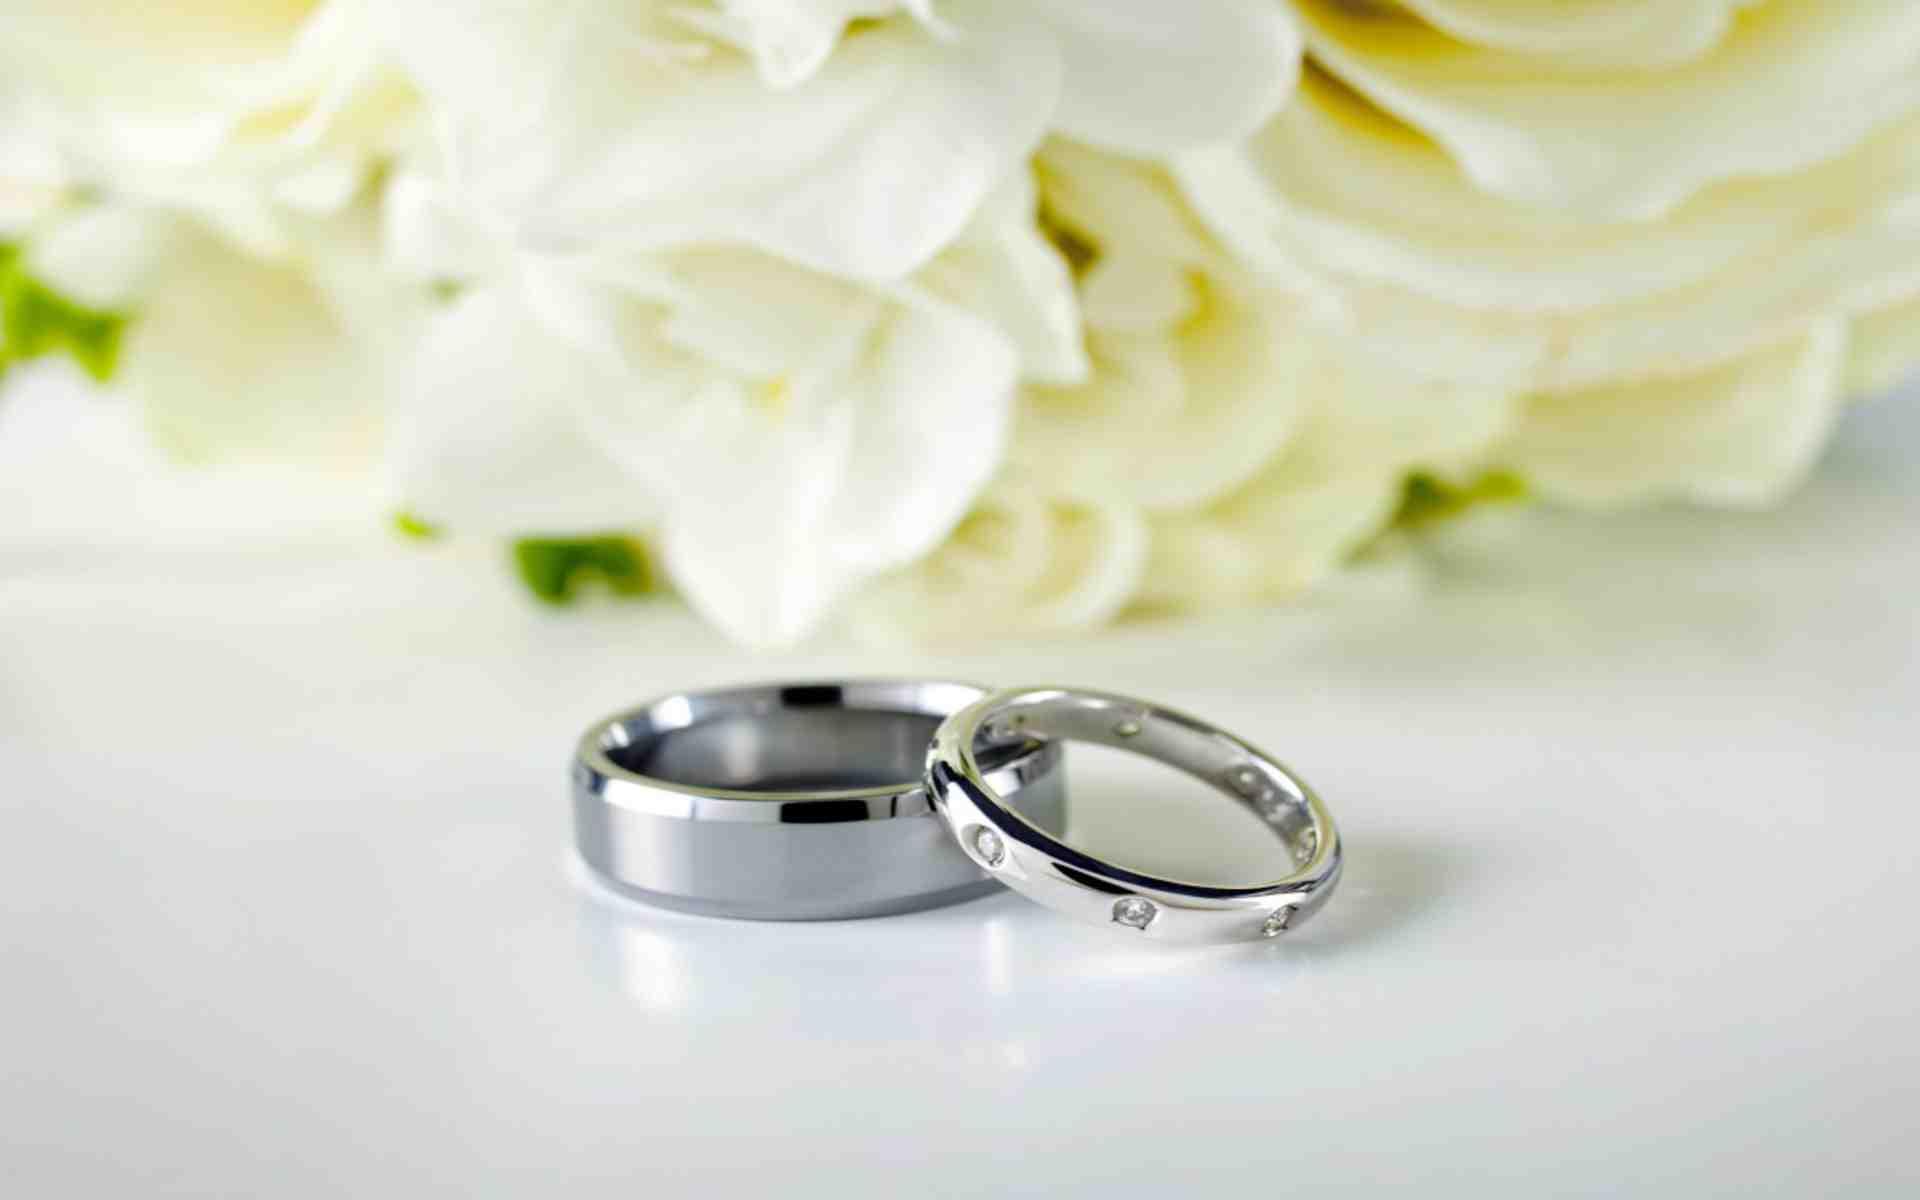 Wedding Rings And Flowers Wallpaper Simple Design 3 On Rings Wedding Ideas